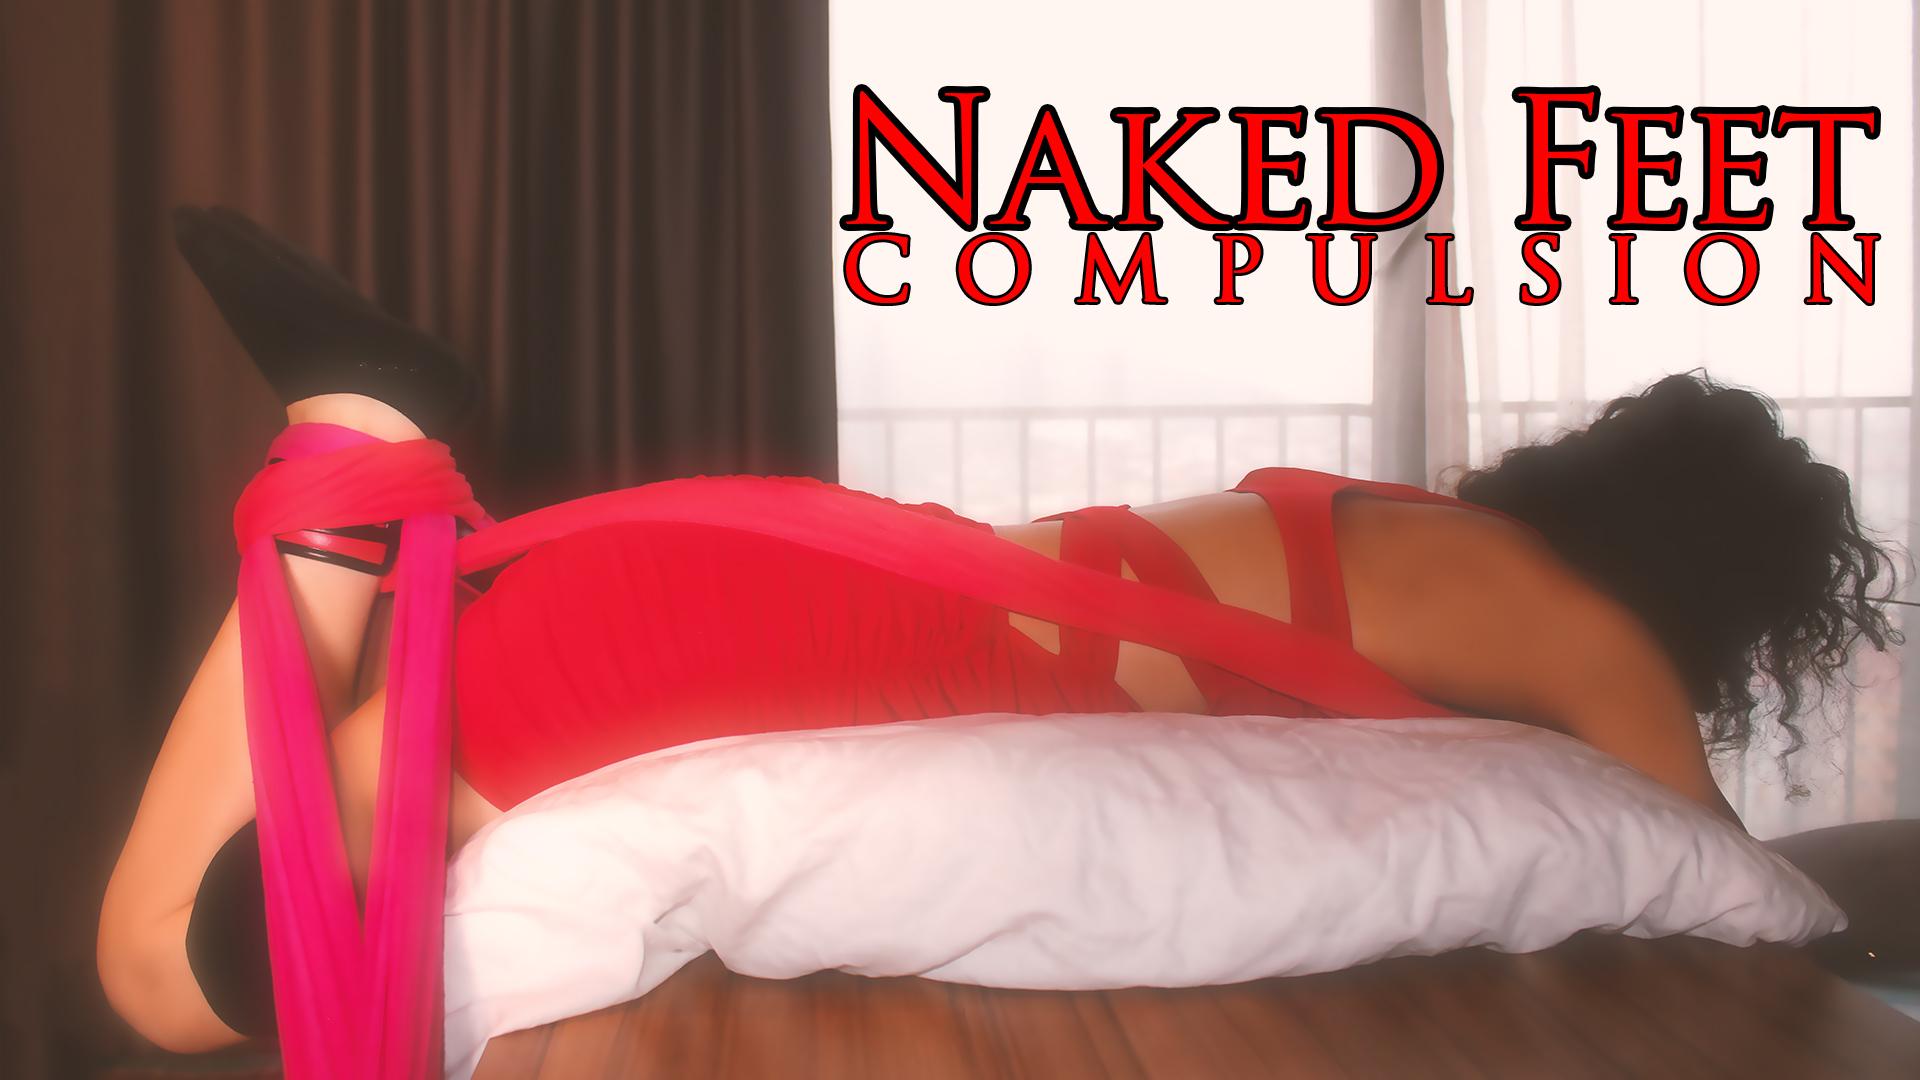 Naked Feet Compulsion